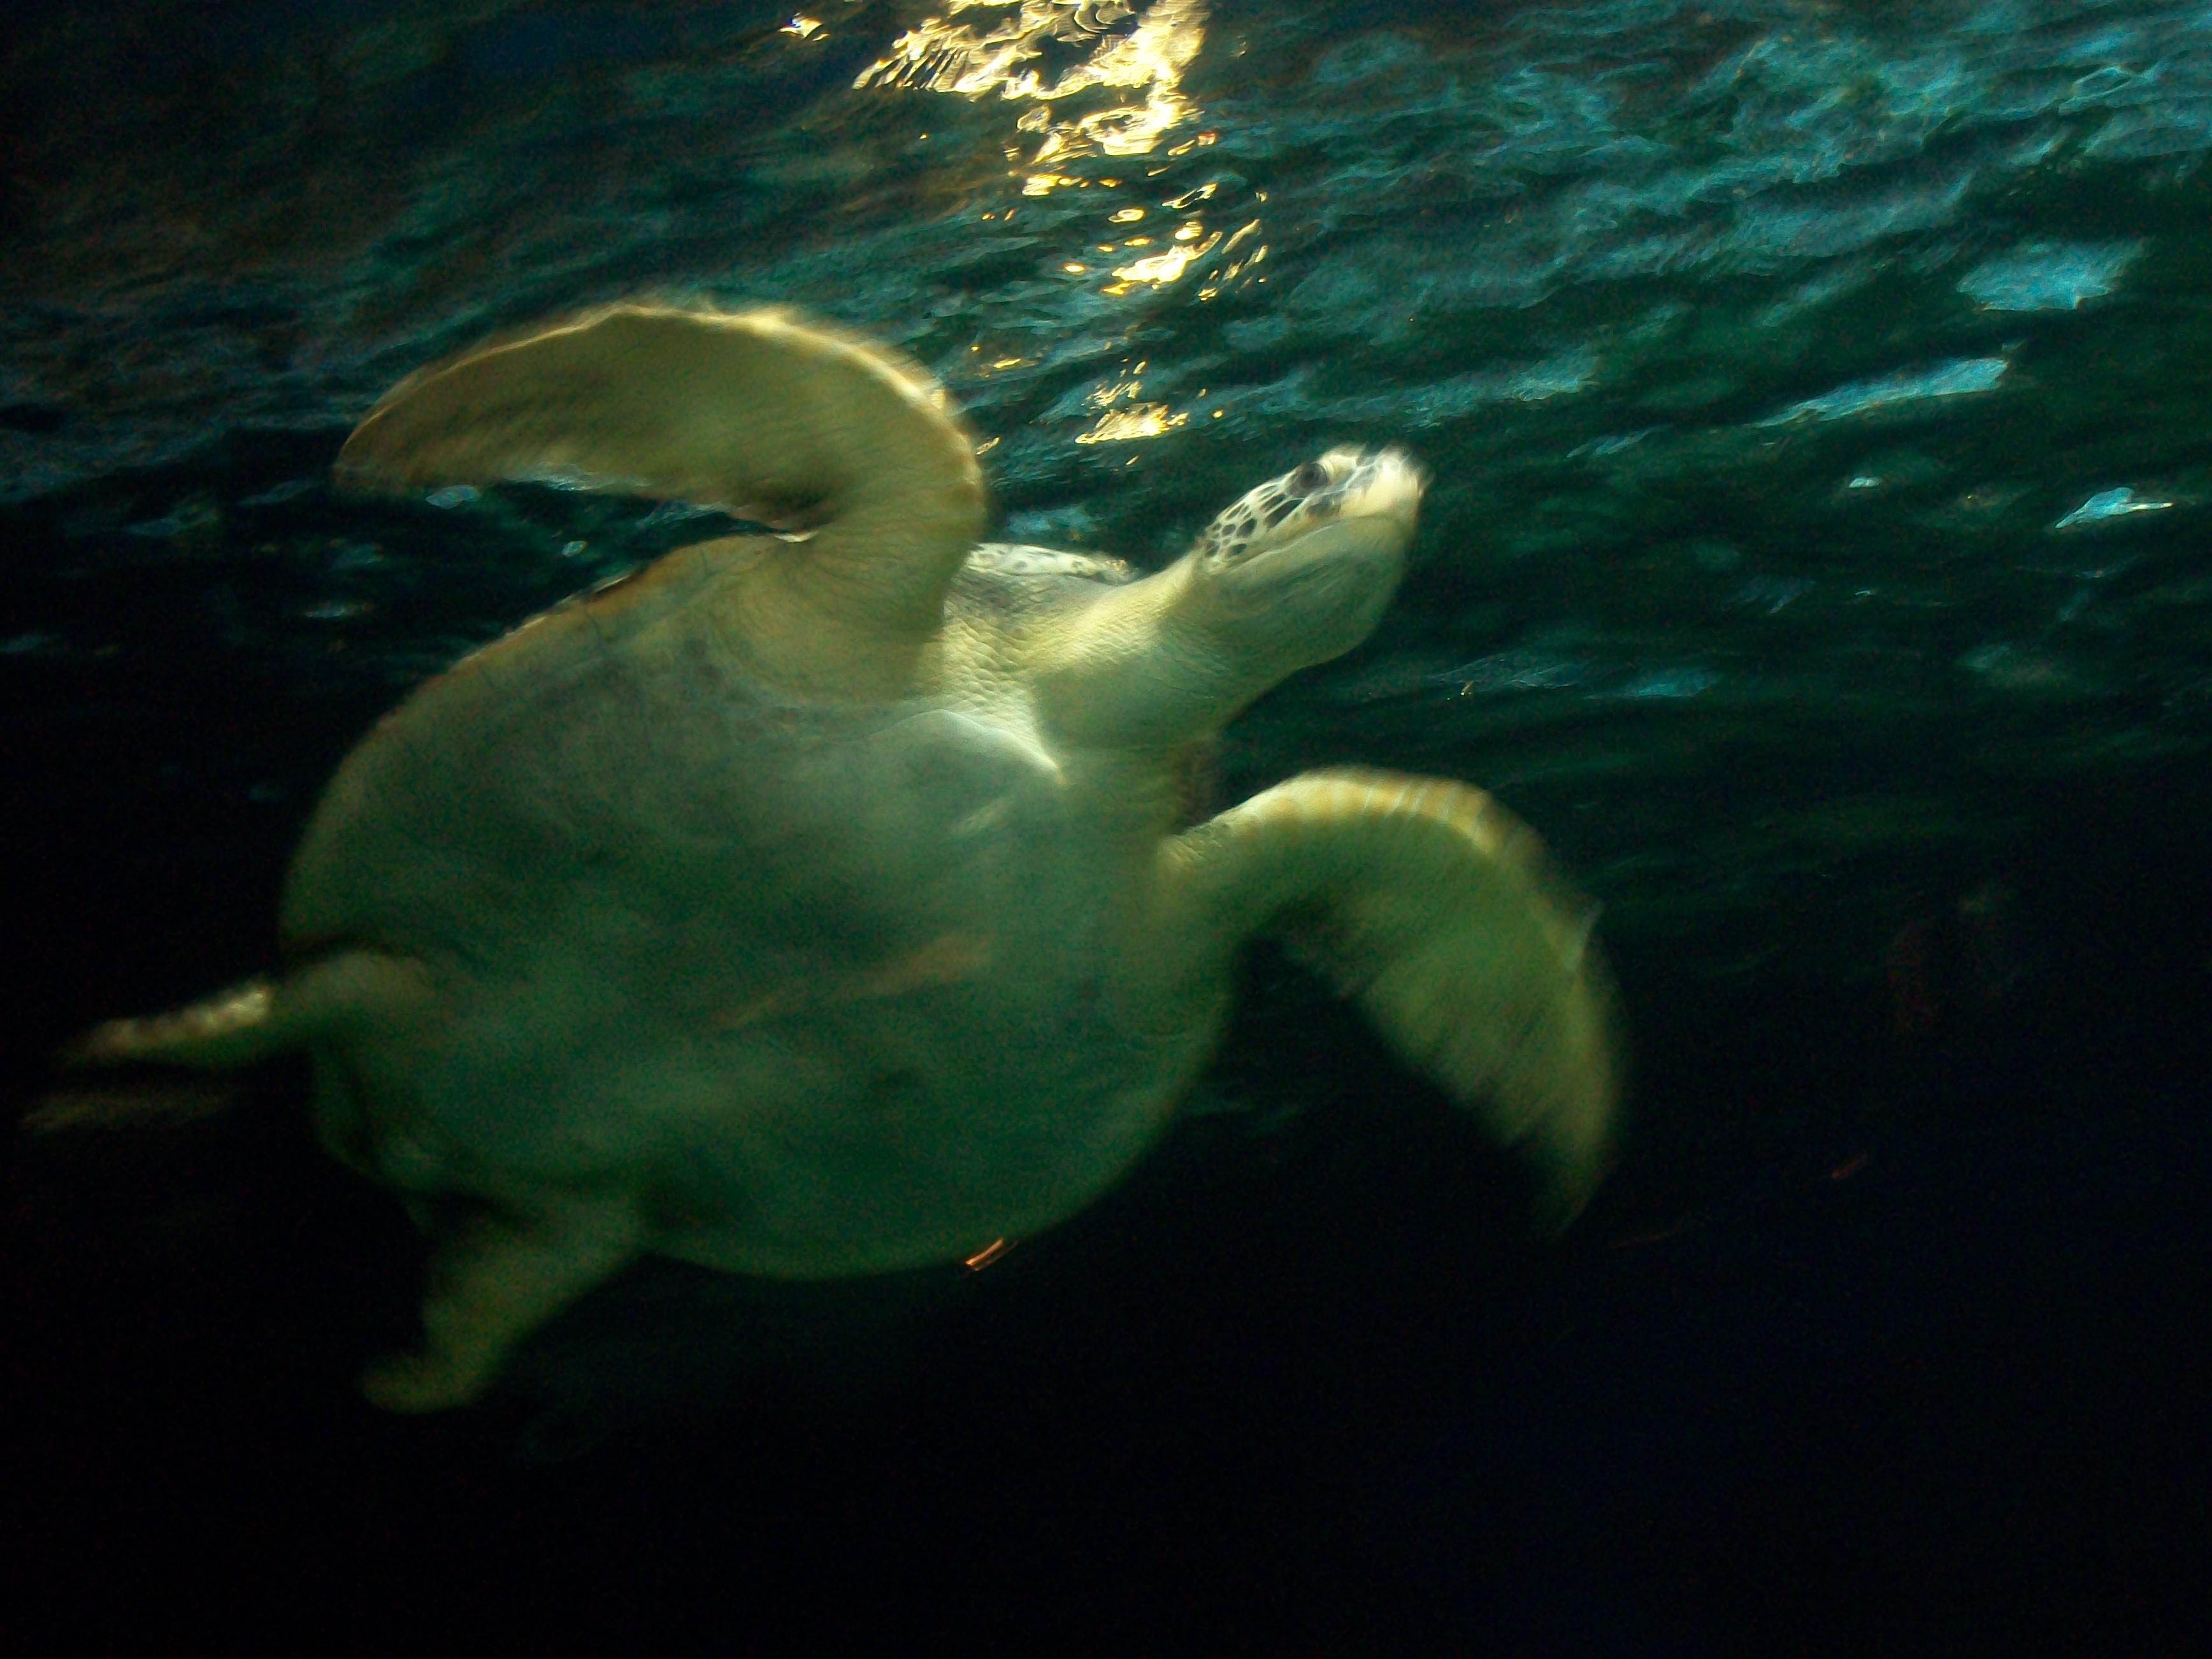 Vancouver Aquarium New To Vancouver